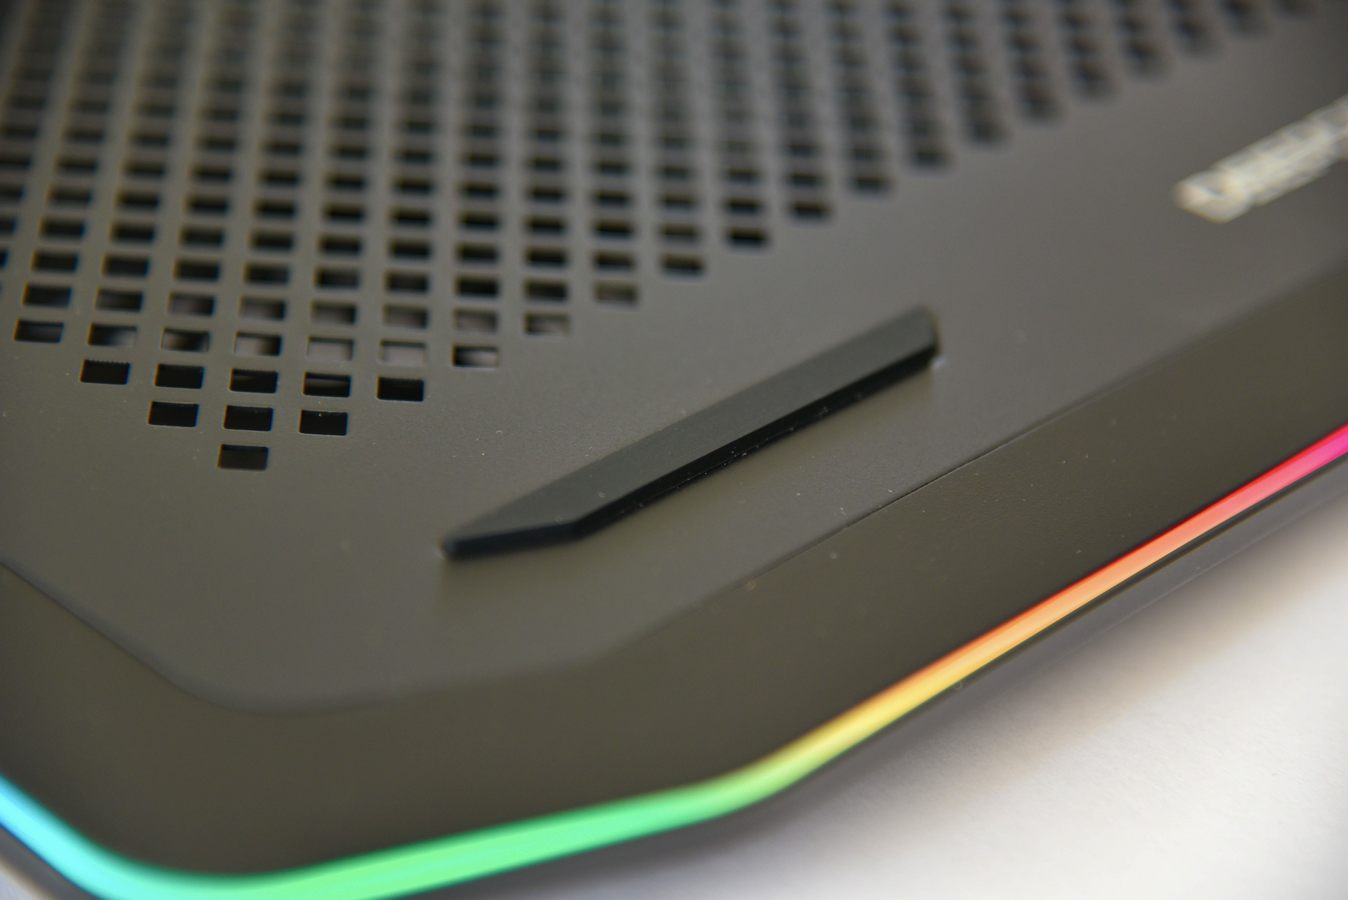 بررسی کولر نوت بوک N80 RGB شرکت DeepCool